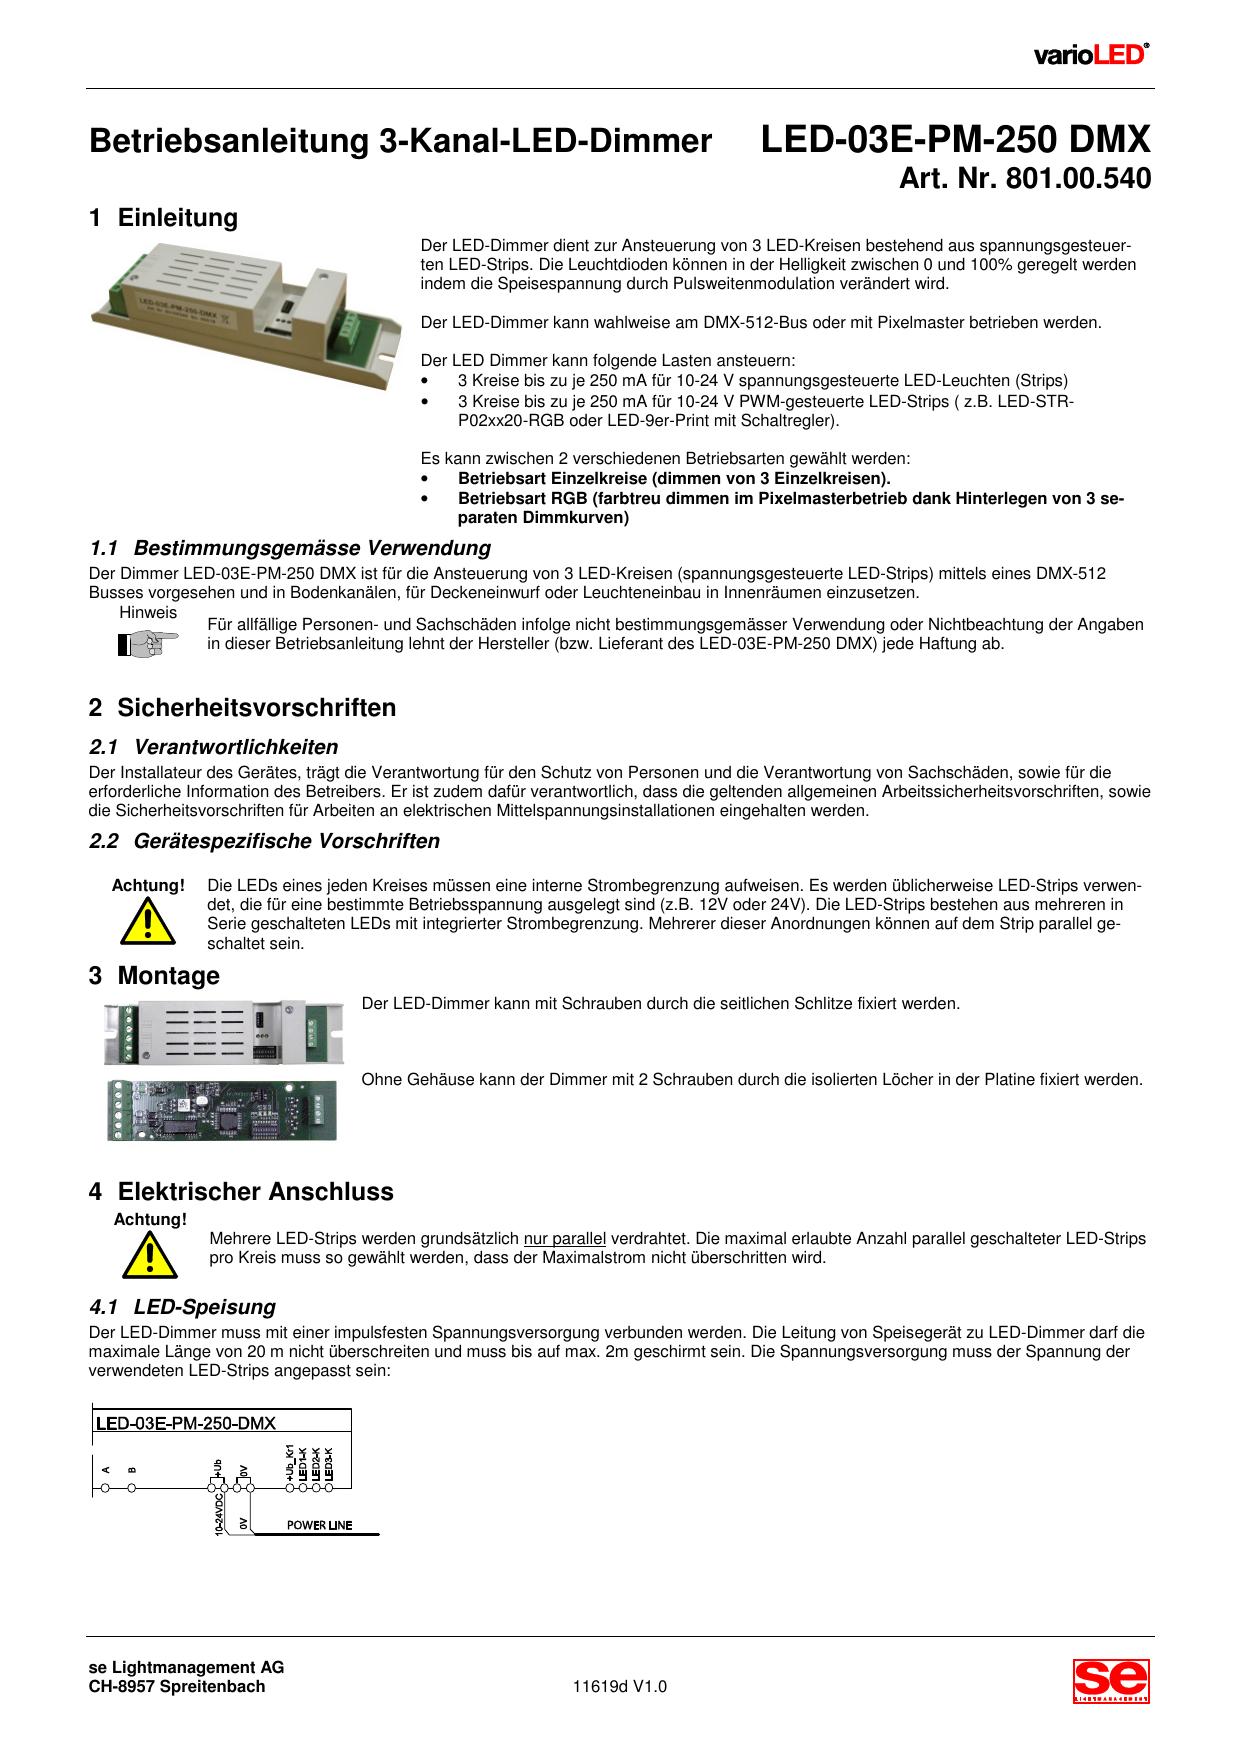 Betriebsanleitung 3-Kanal-LED-Dimmer LED-03E-PM-250 DMX | manualzz.com